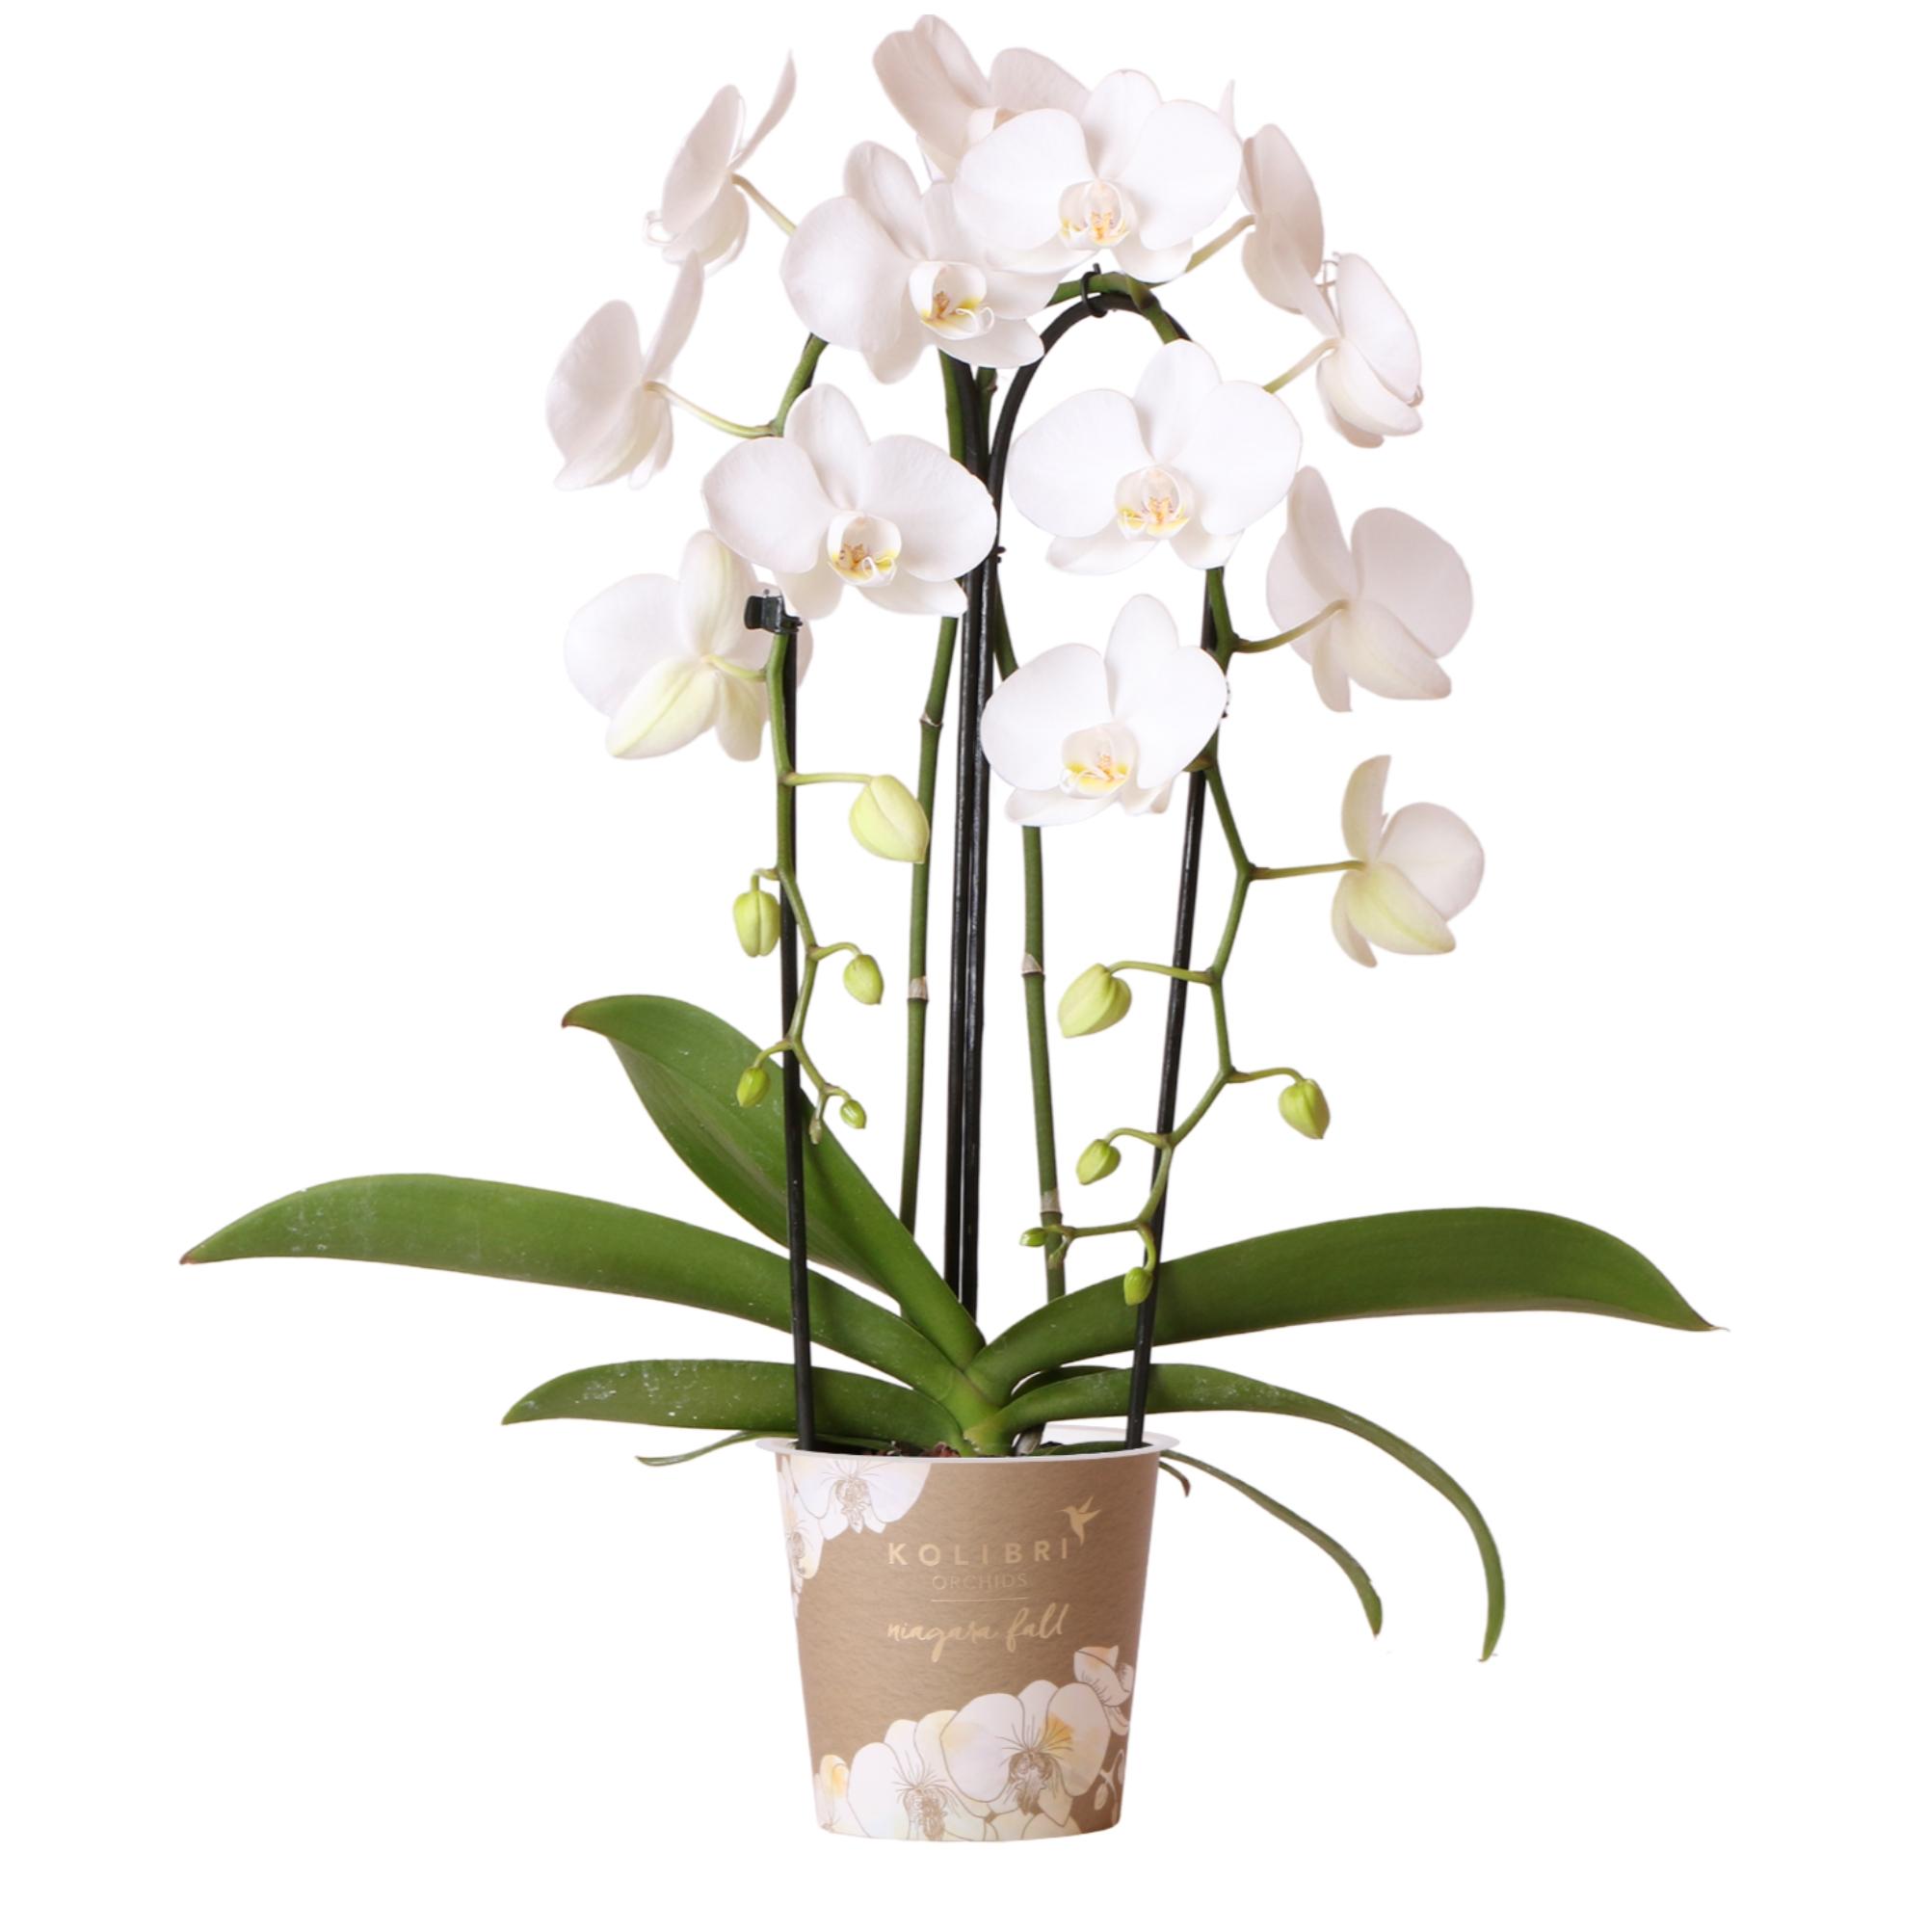 Kolibri Company - Kolibri Orchids Niagara Fall white 12cm orchidee kopen